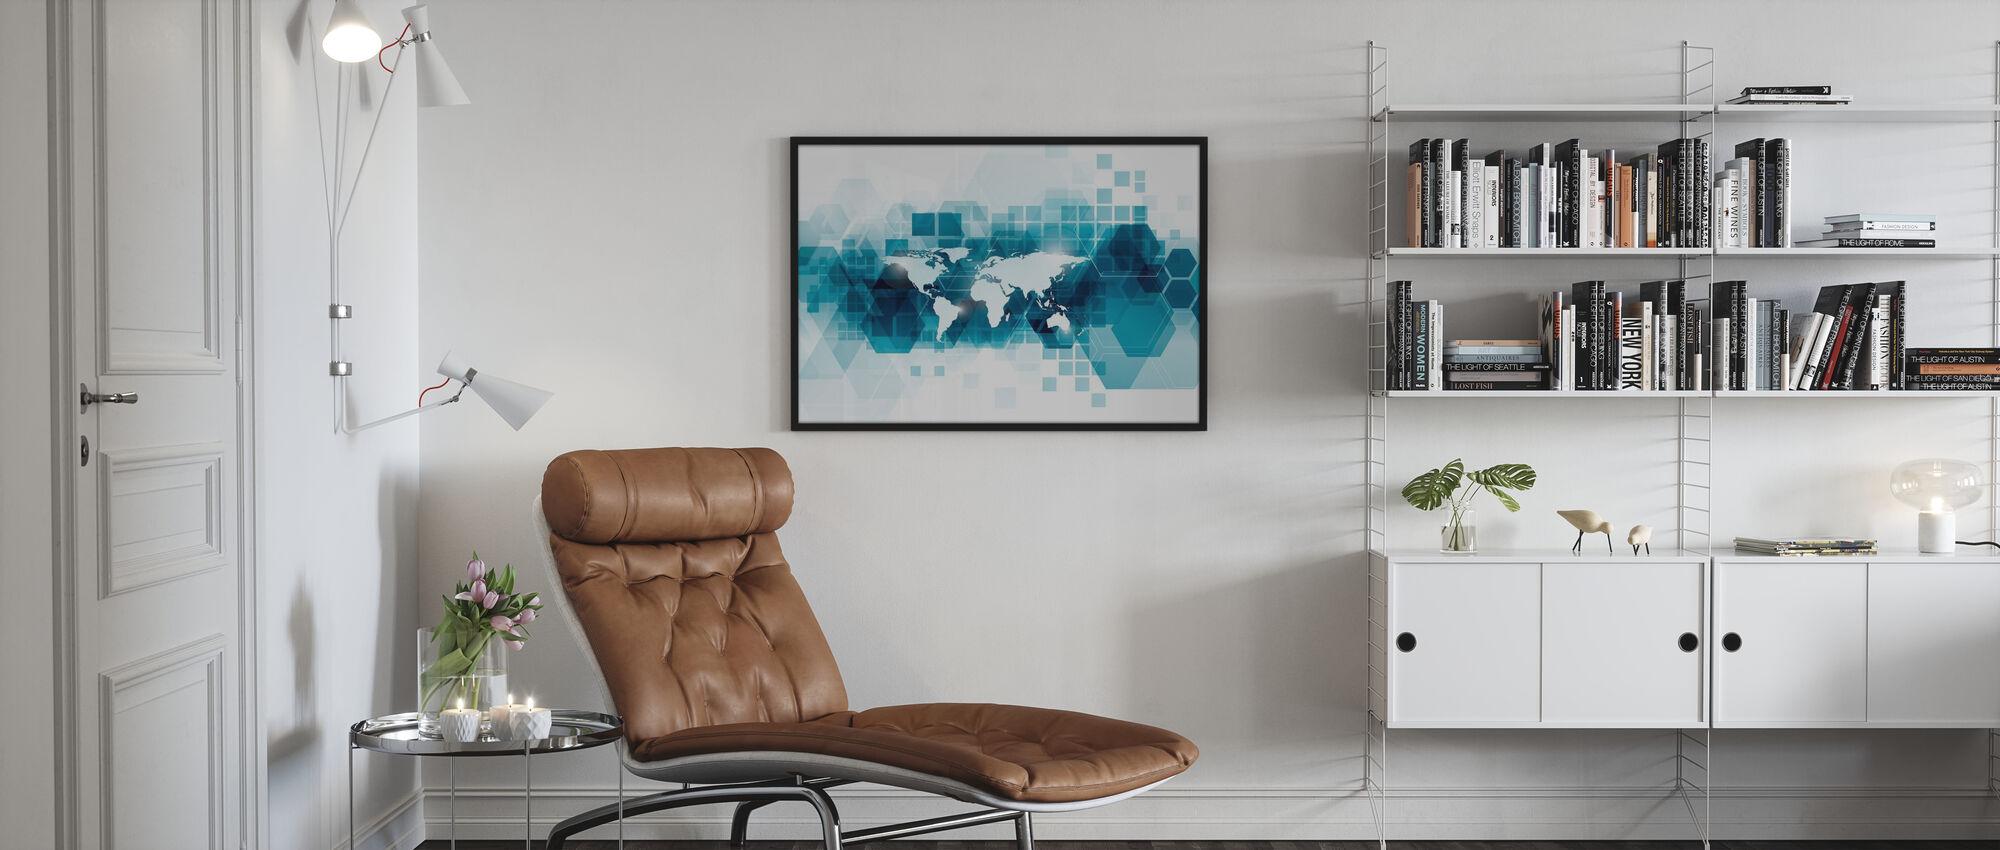 Transparent Vector World - Poster - Living Room